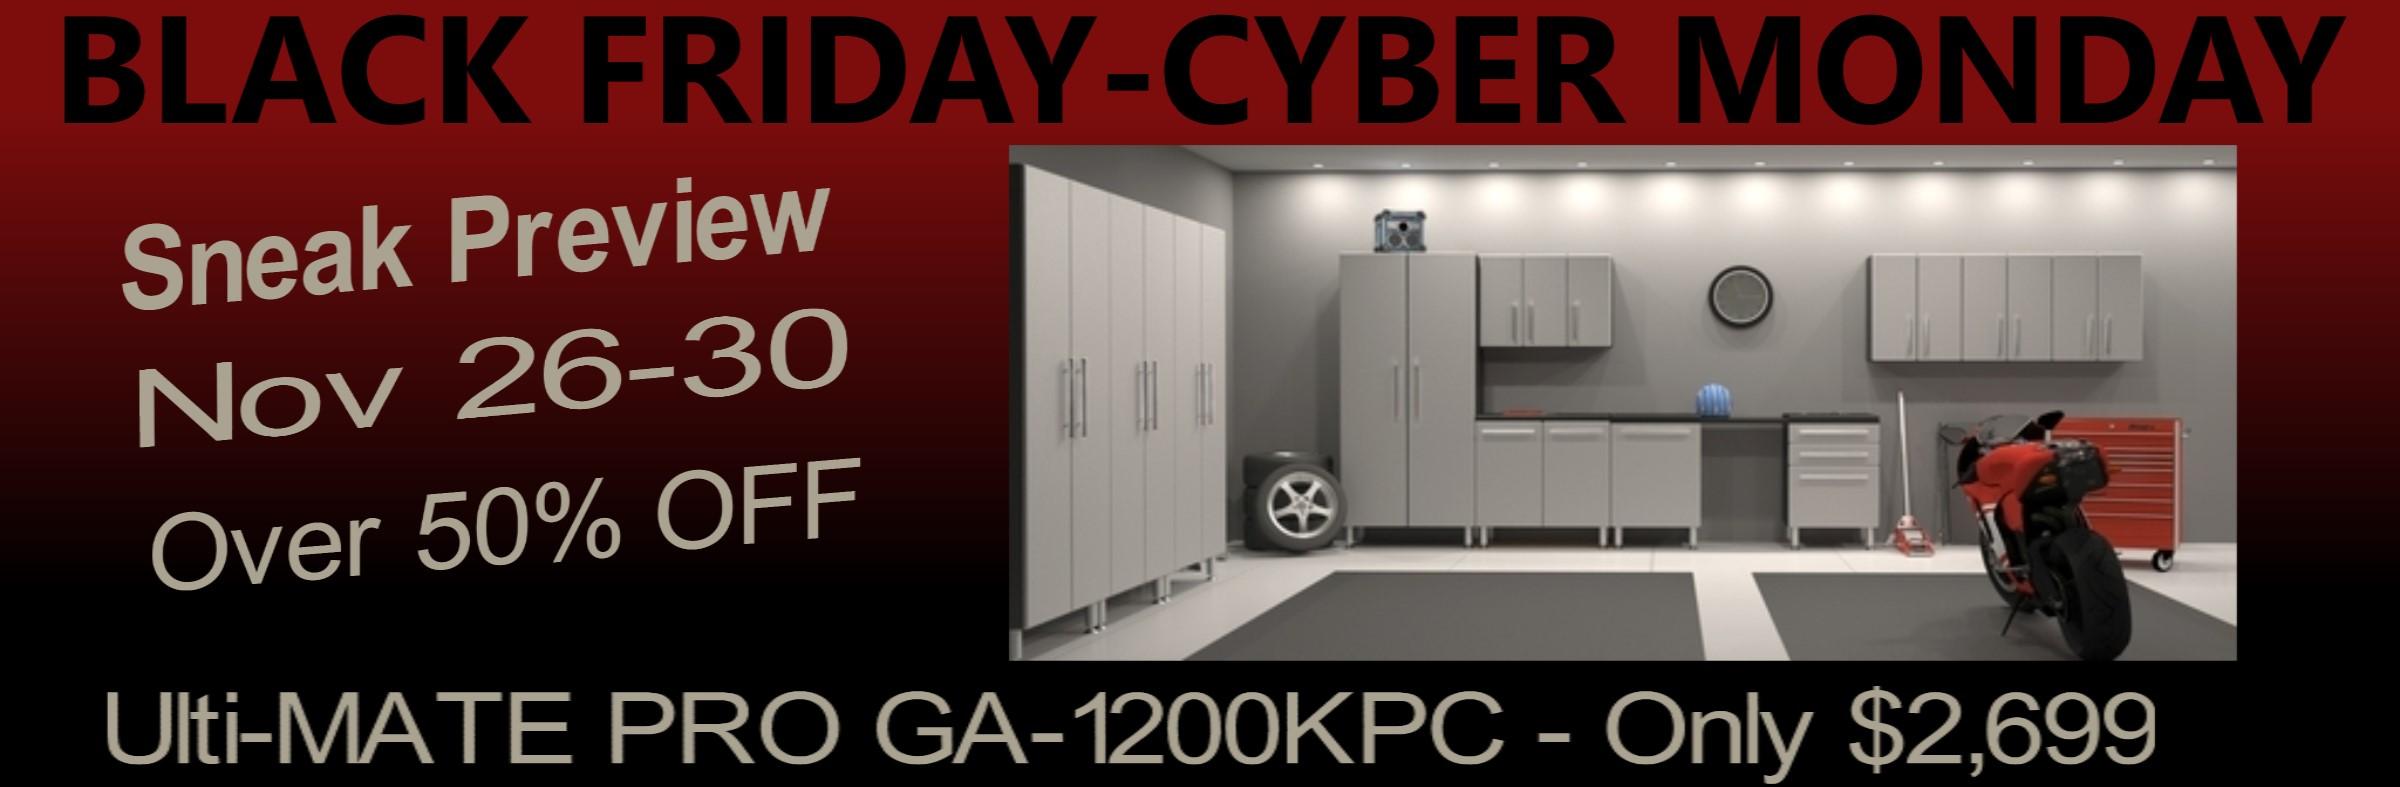 black-friday-ga1200kpc-sneak-preview.jpg